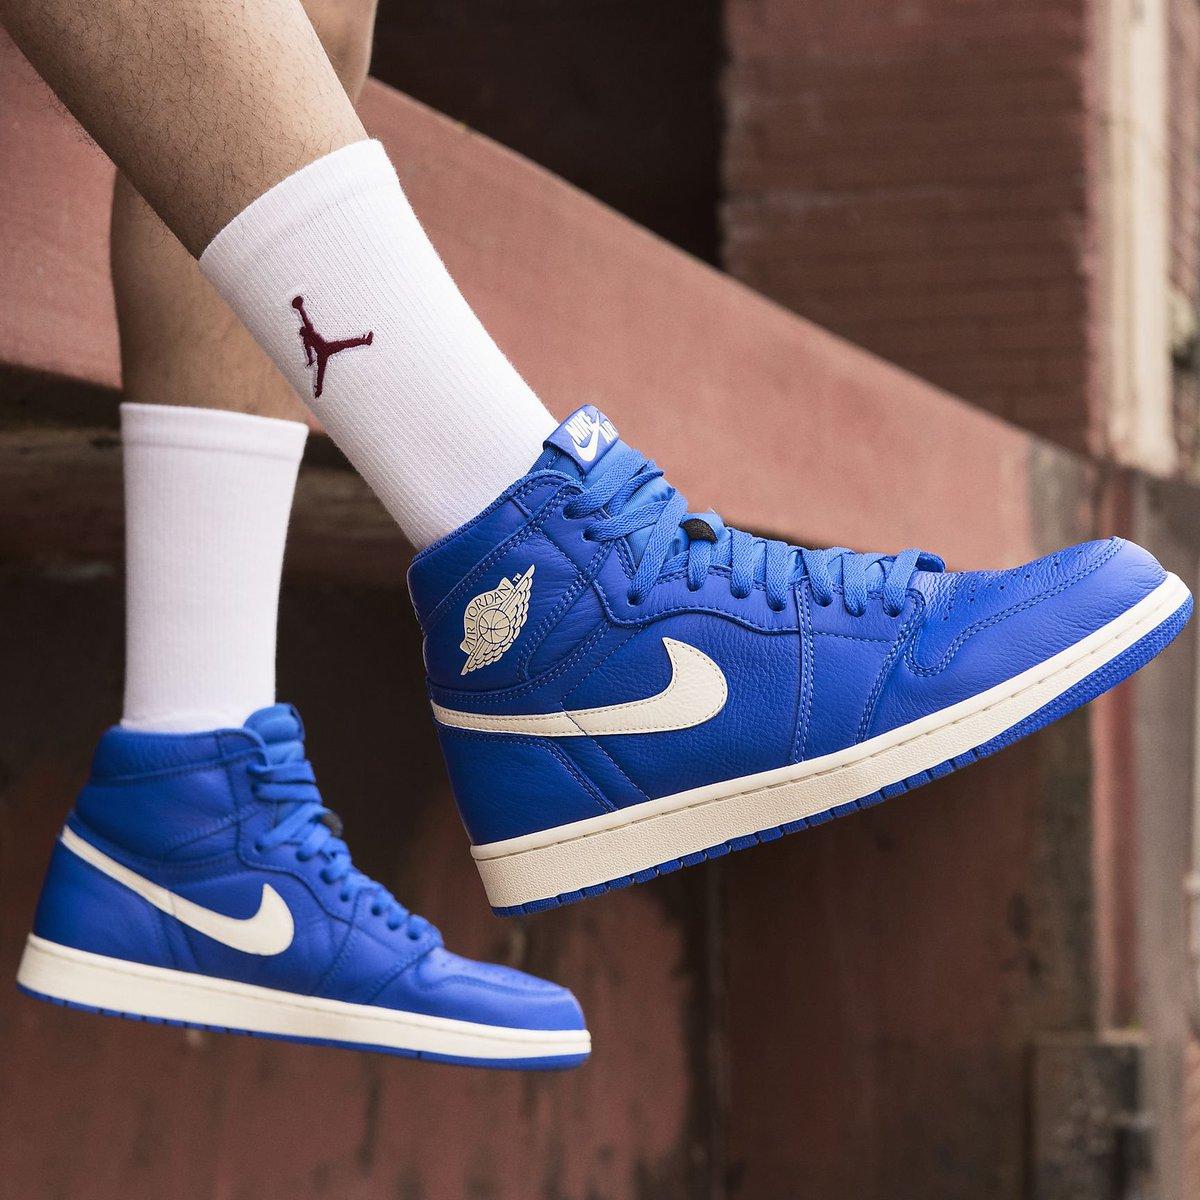 size 40 5f3c5 be100 ... Air Jordan 1 High OG